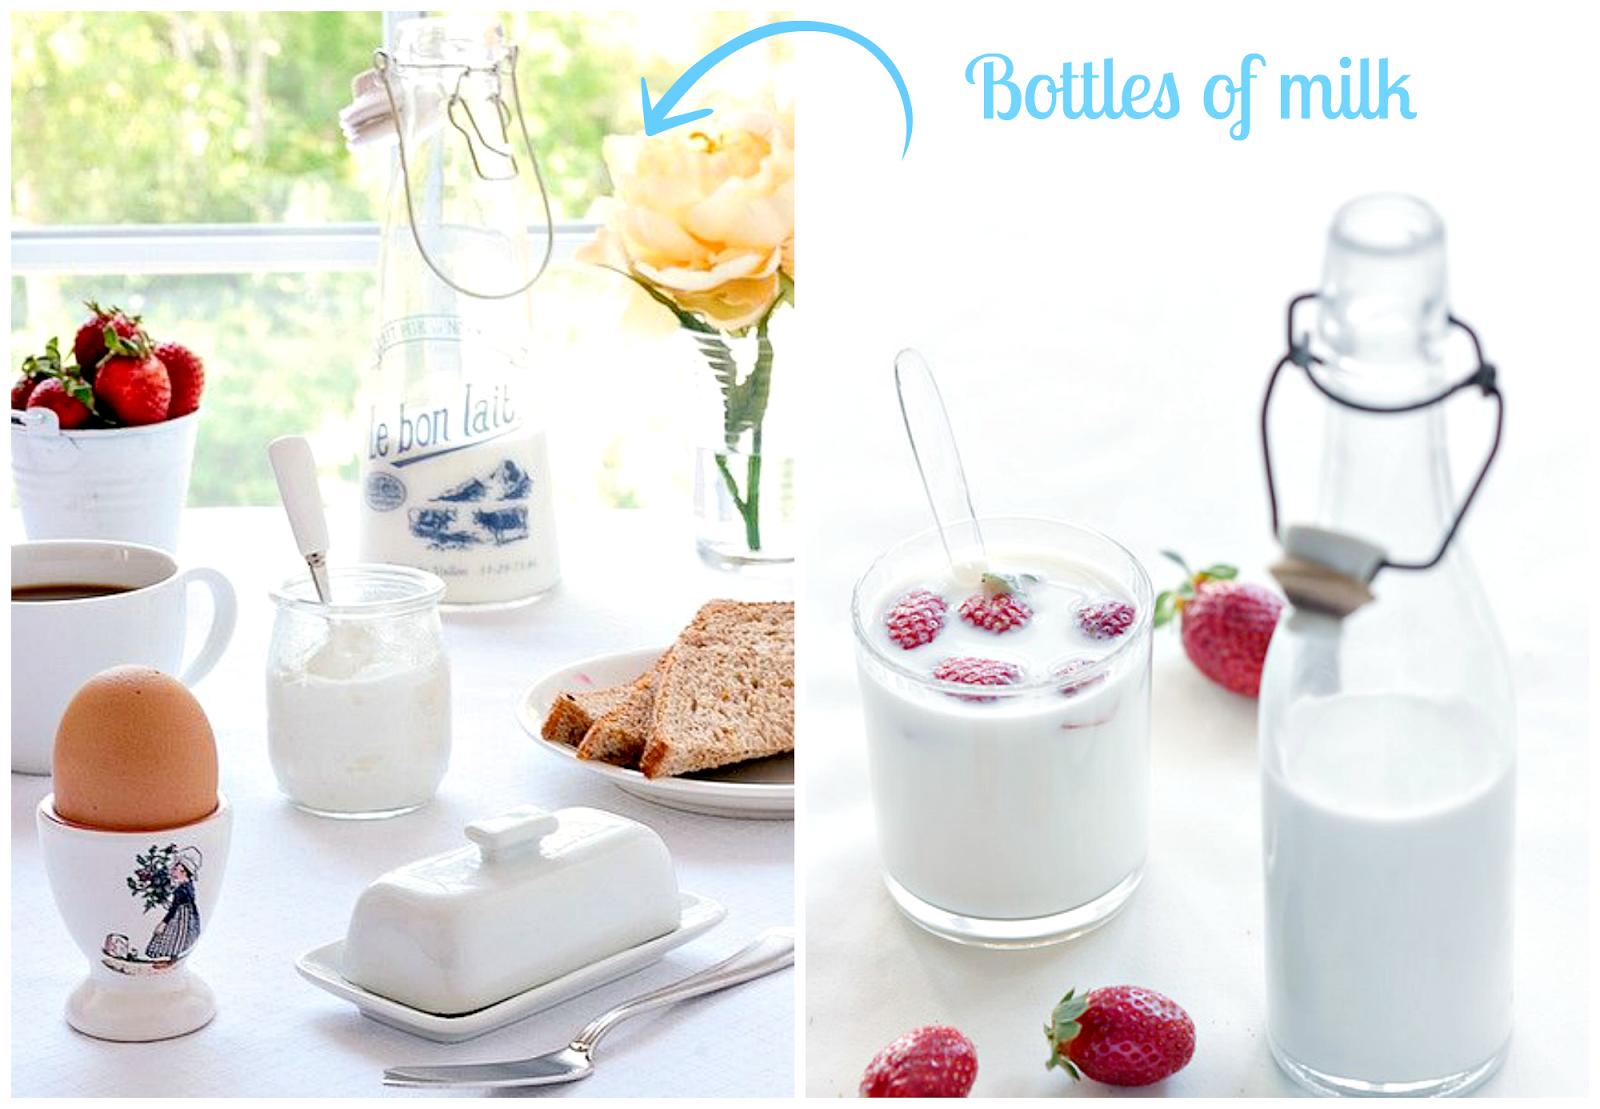 szklane butelki na mleko